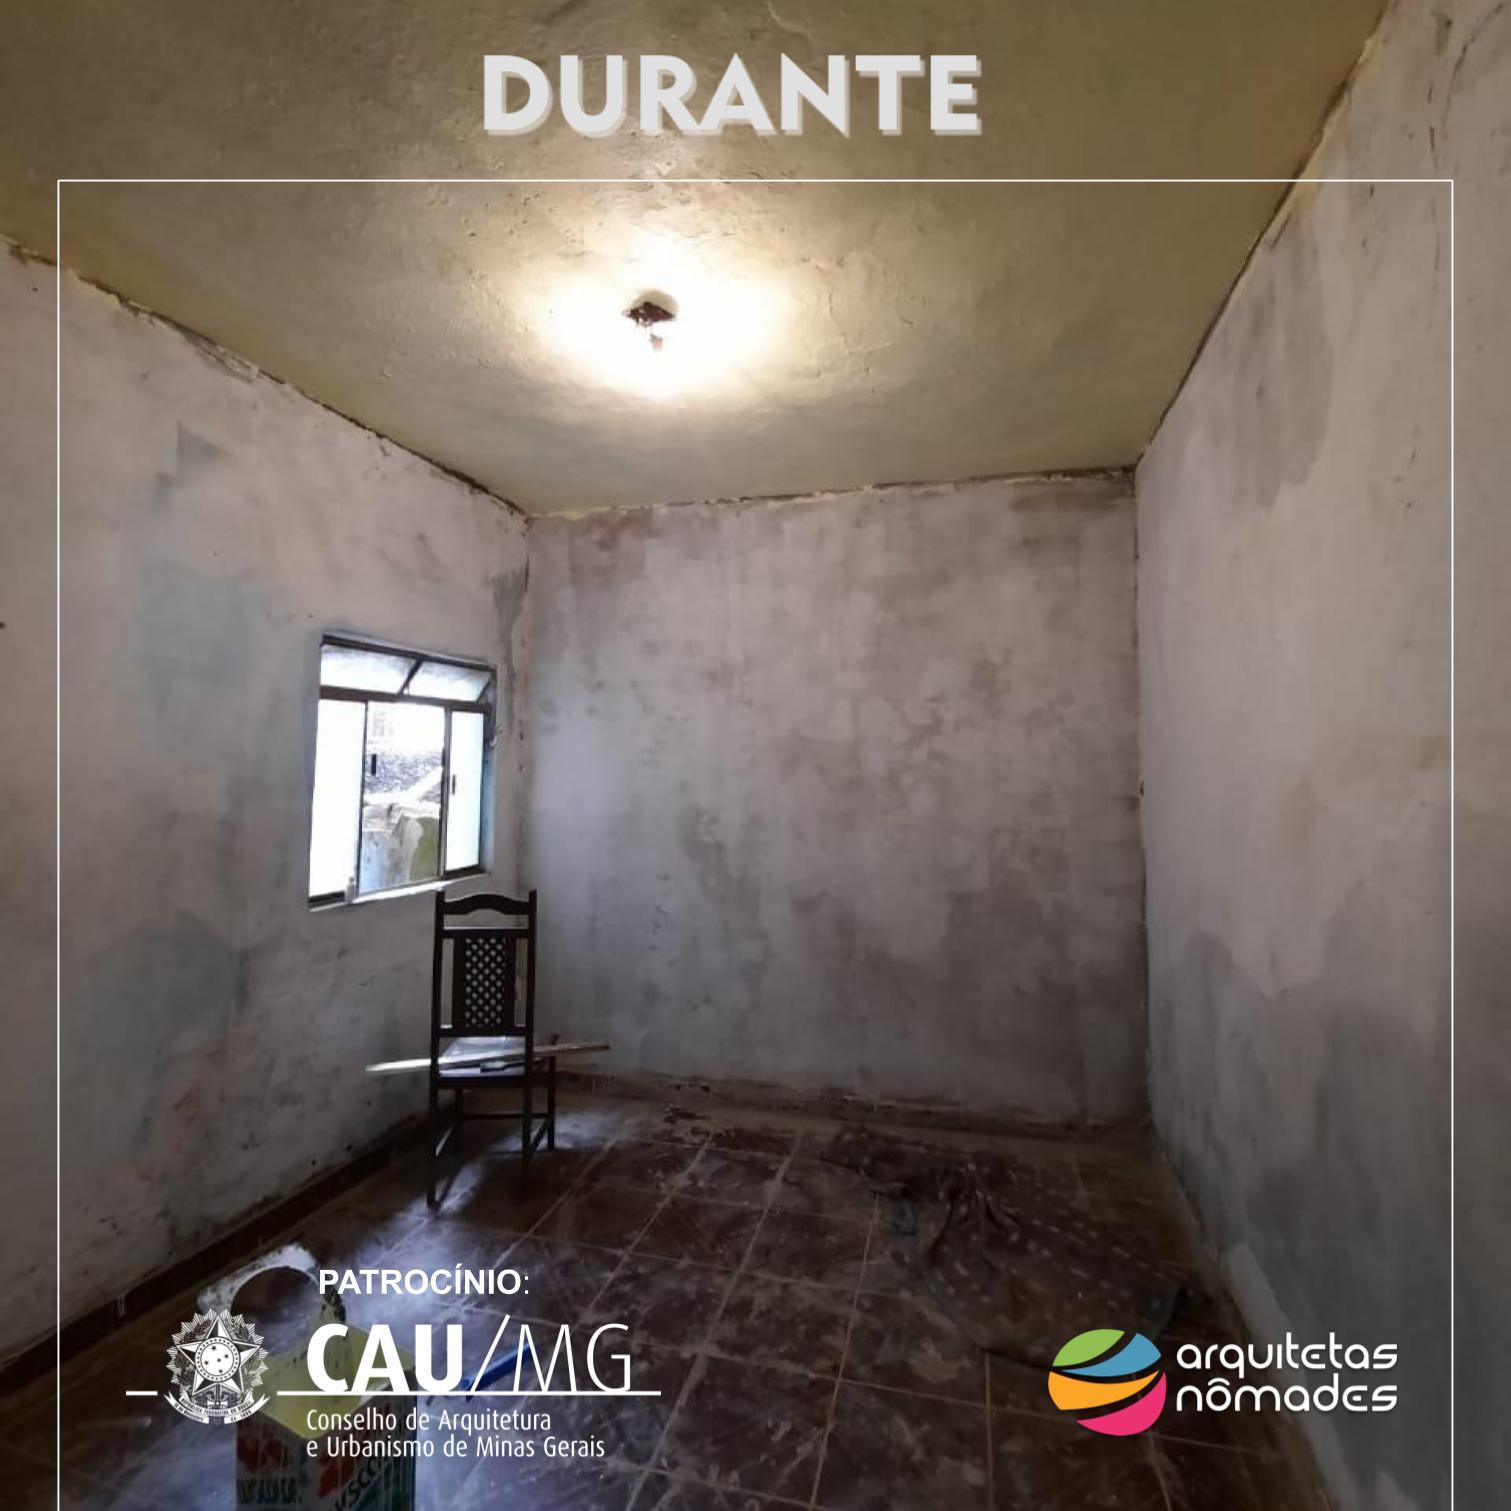 DURANTE2 – sandra